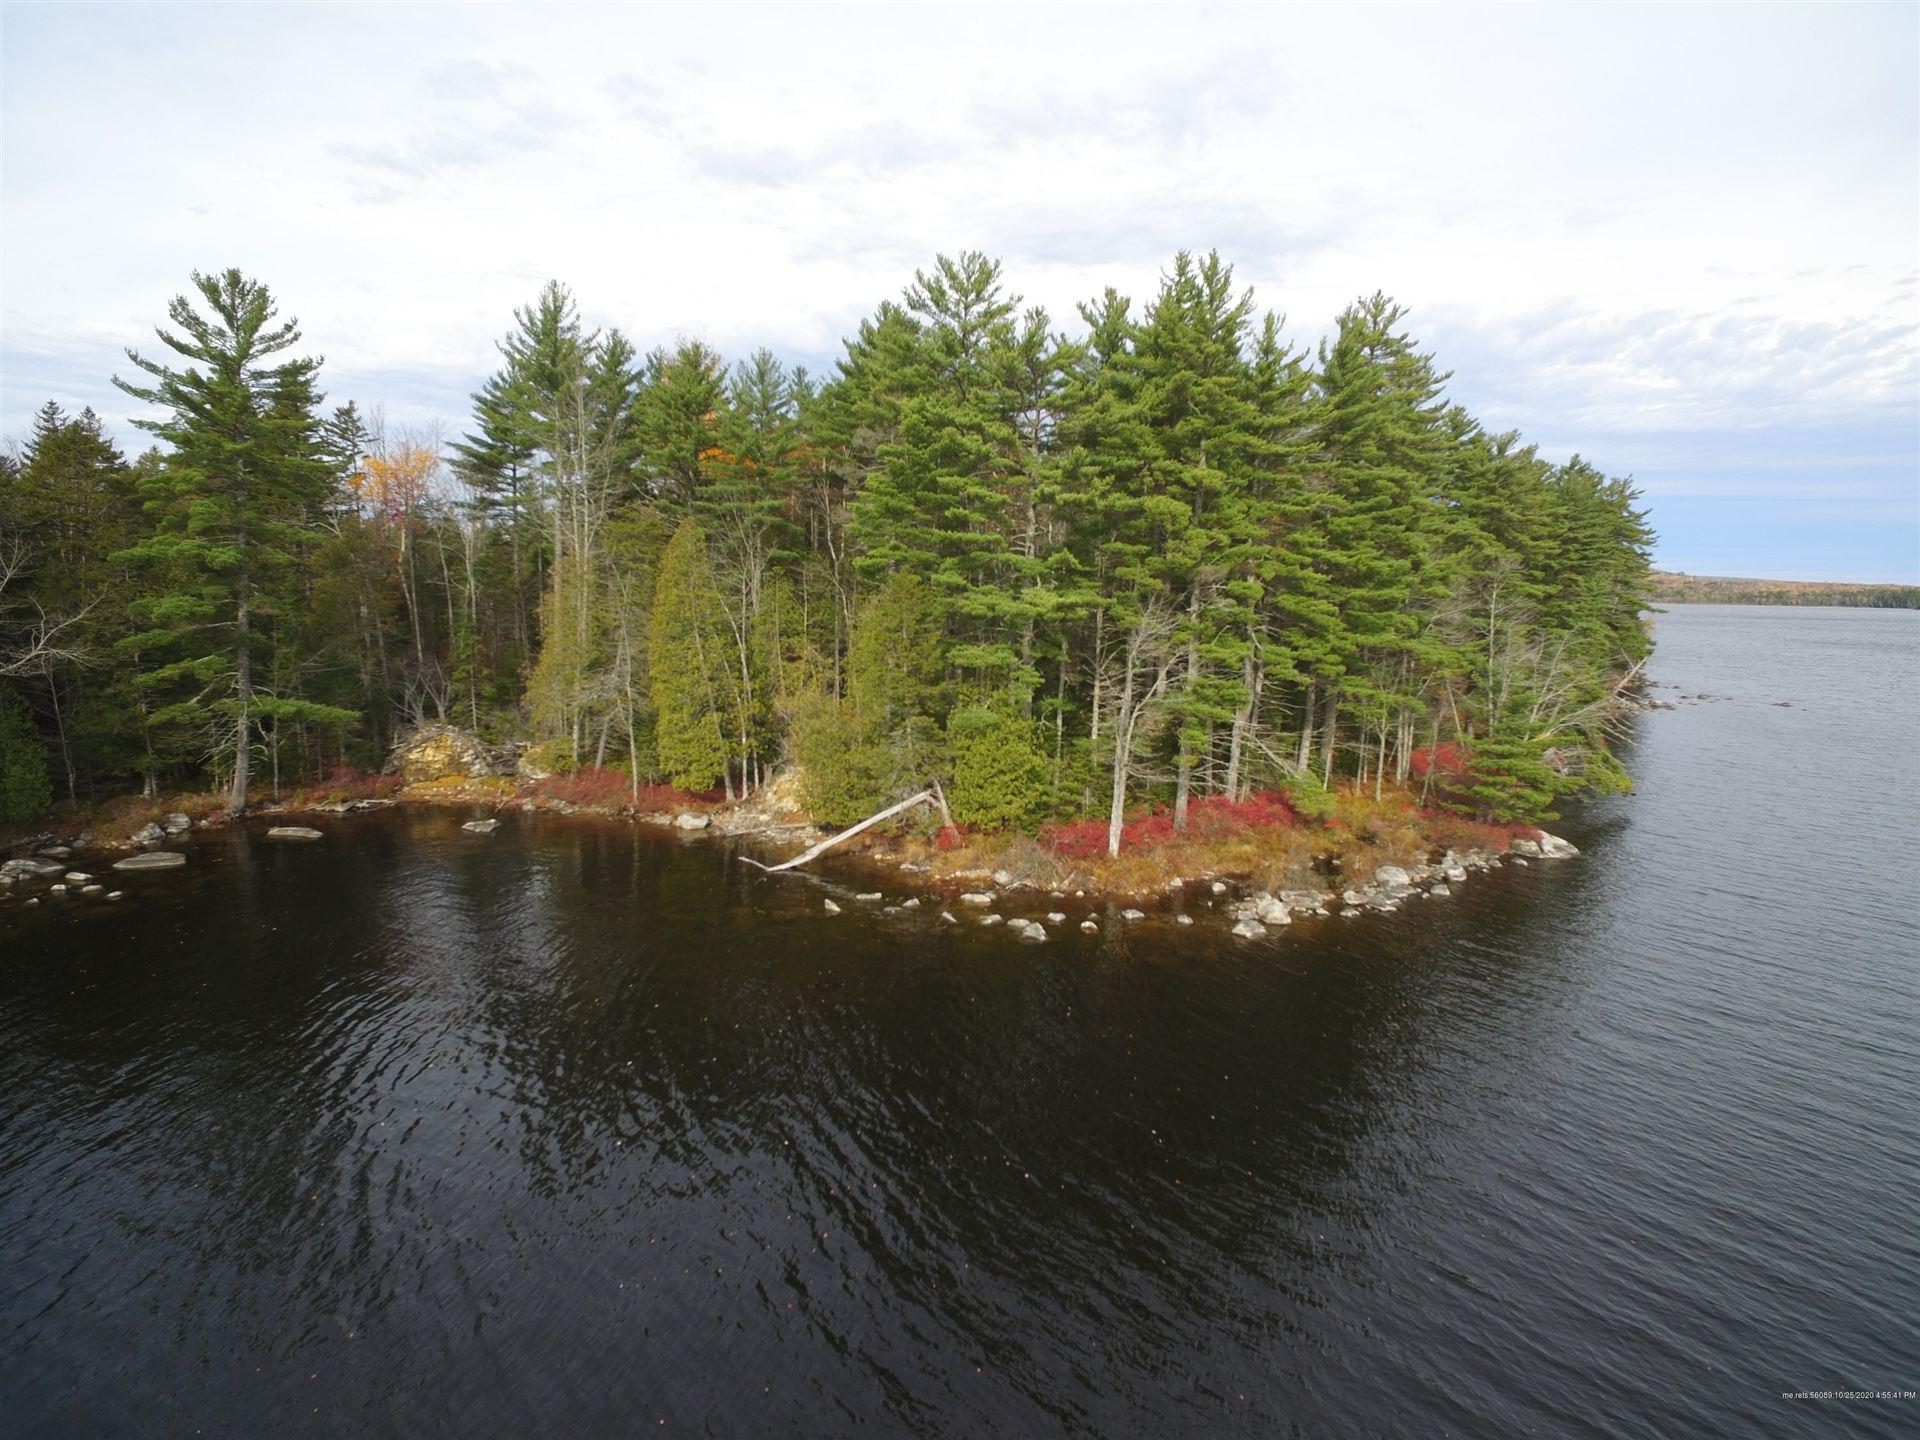 Photo of Lot 5 Pine Whisper II Lake, Lincoln, ME 04457 (MLS # 1473949)